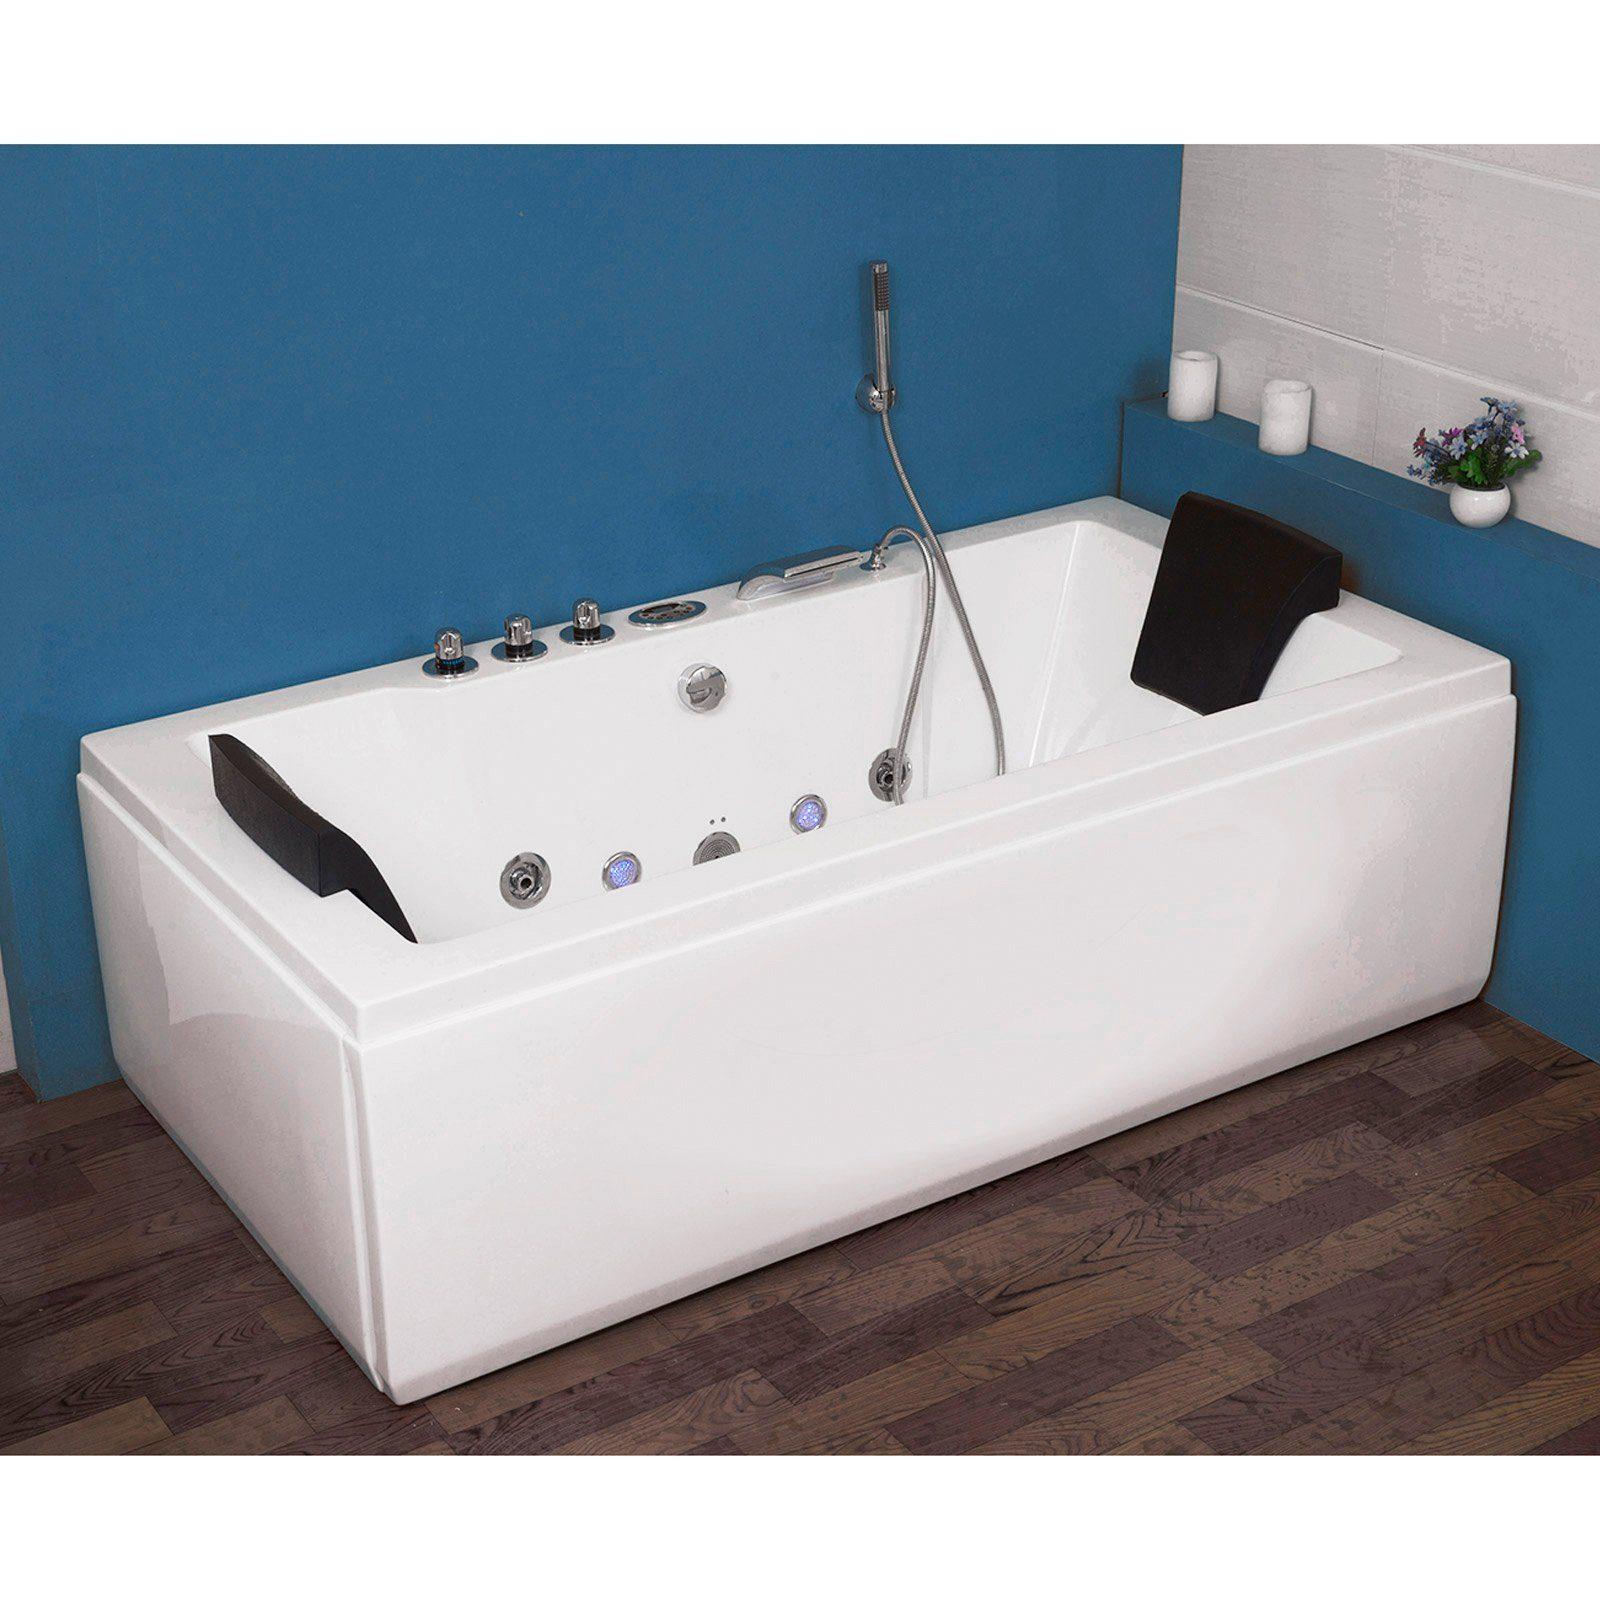 Whirlpool Bad Informatie : Complete set whirlpoolbad white m light« bxdxh in cm